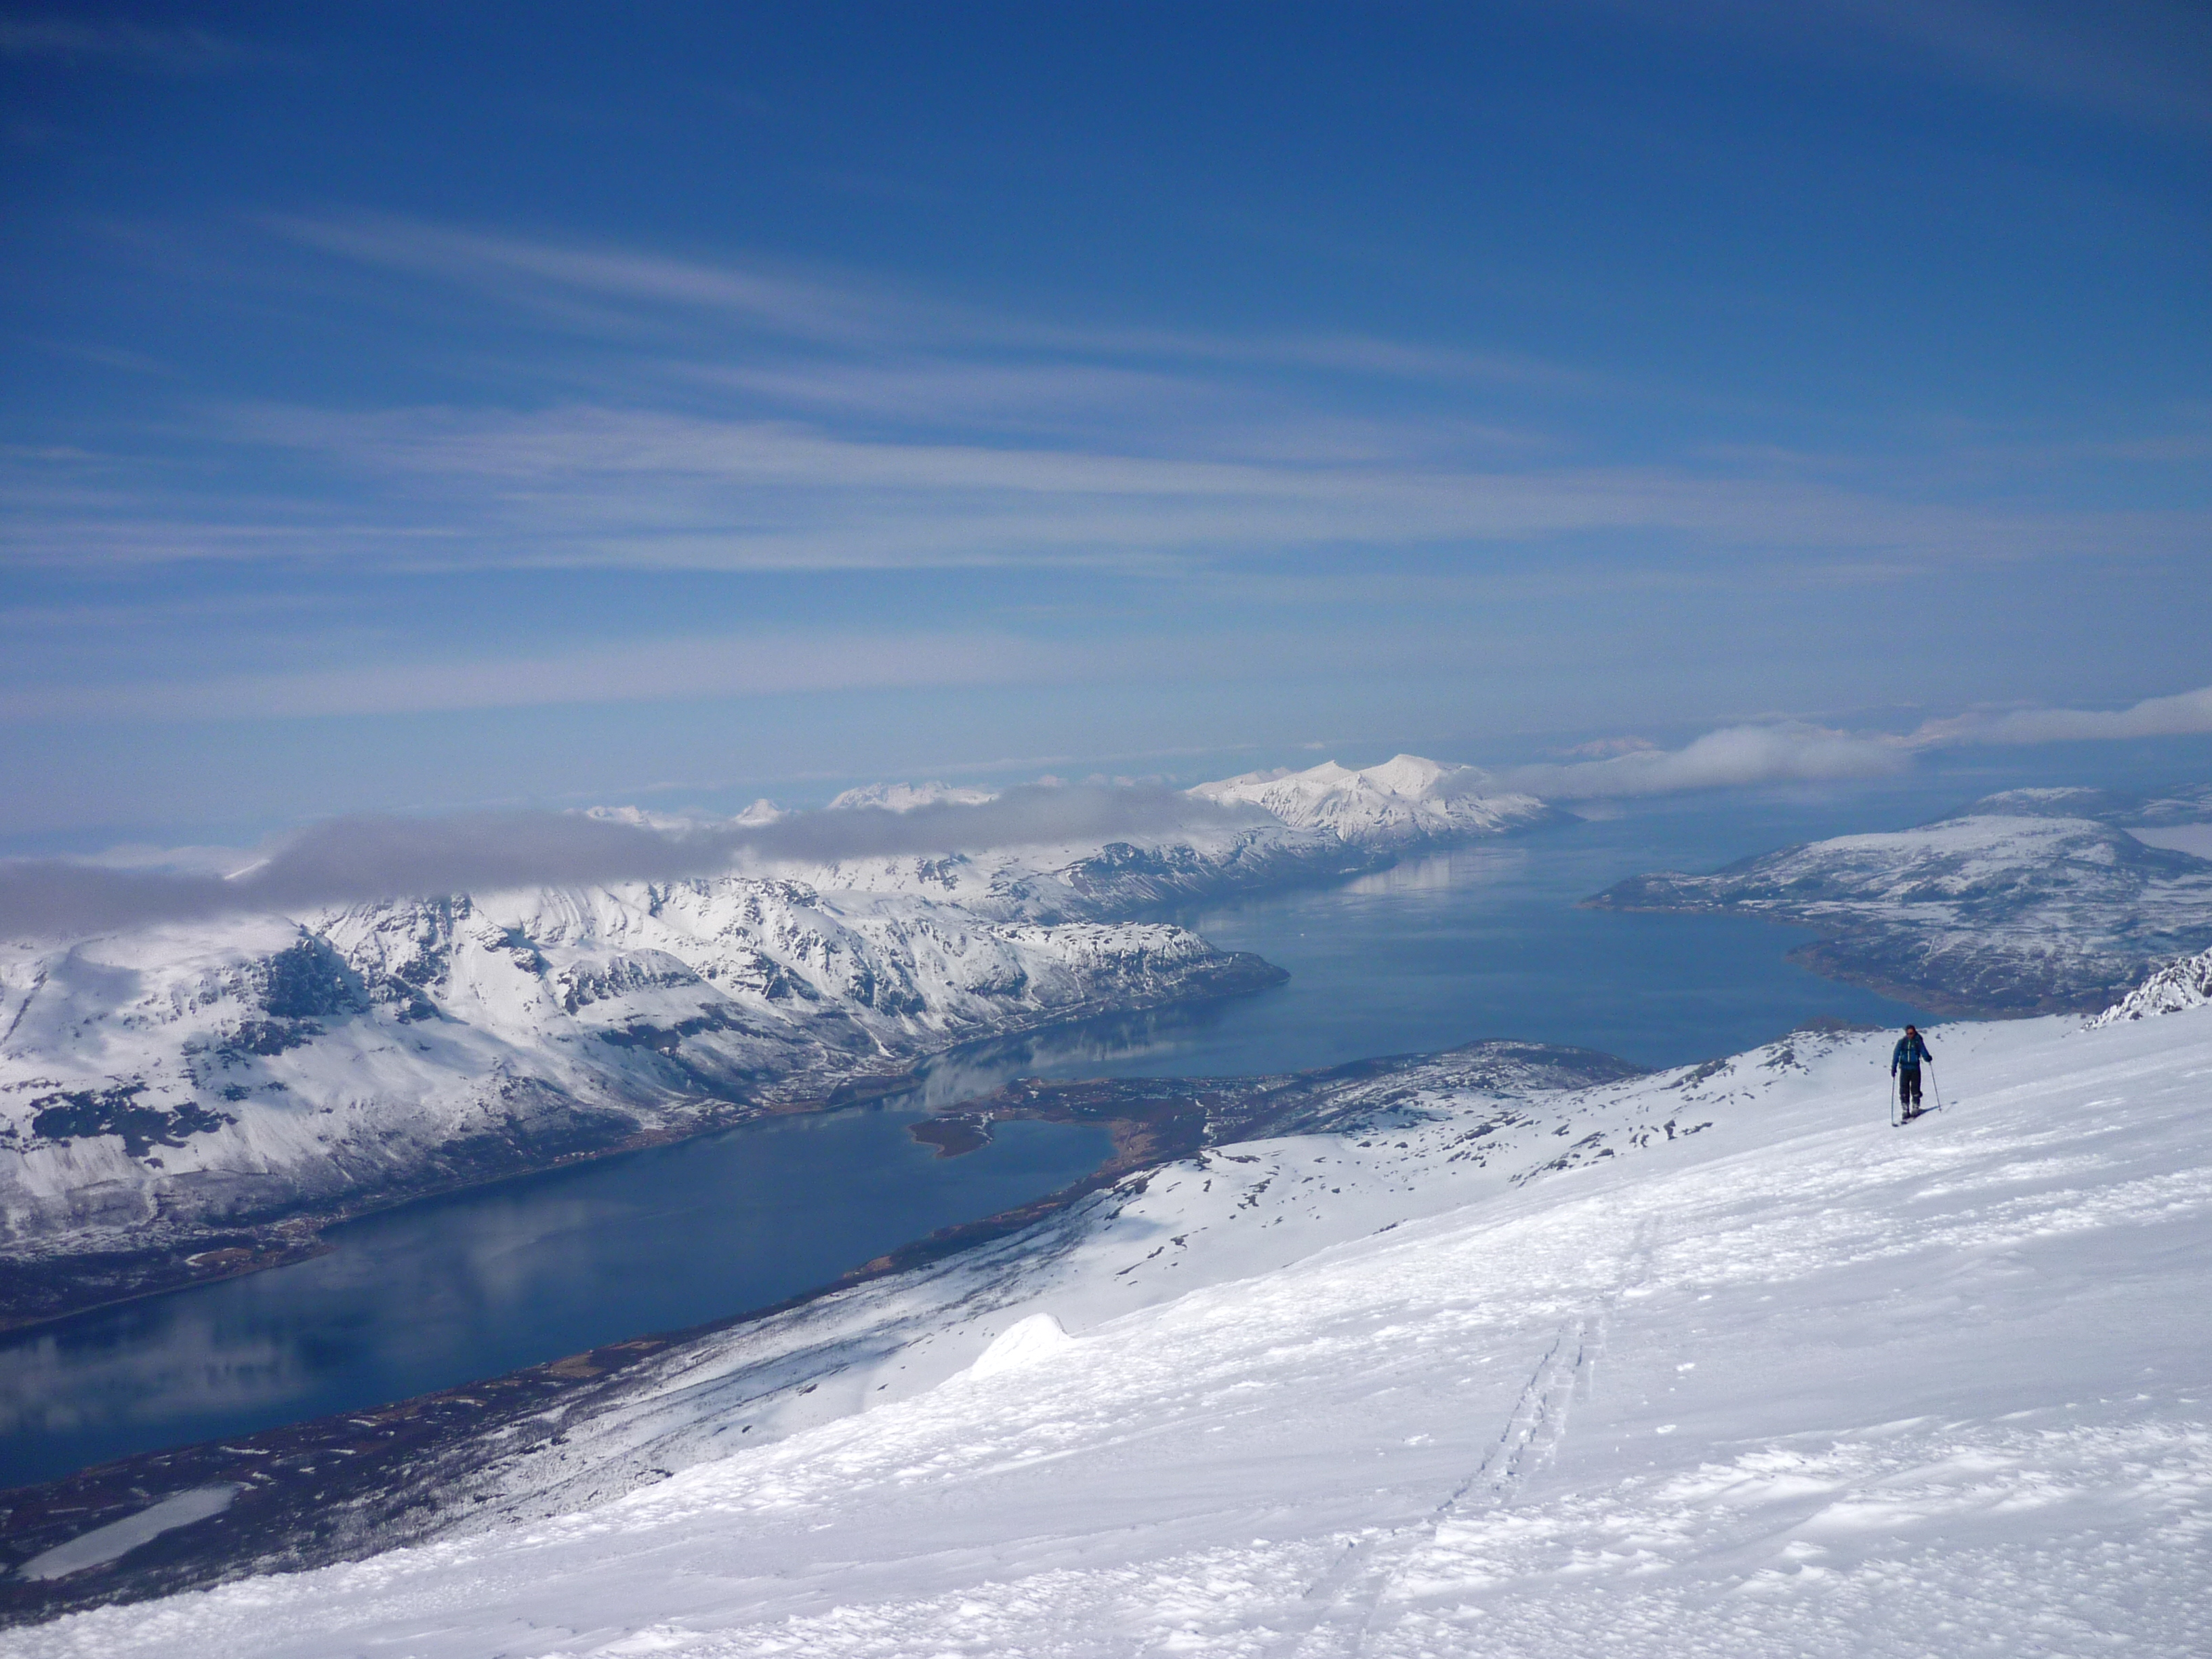 The summit plateau of Fugdldalsfjellet